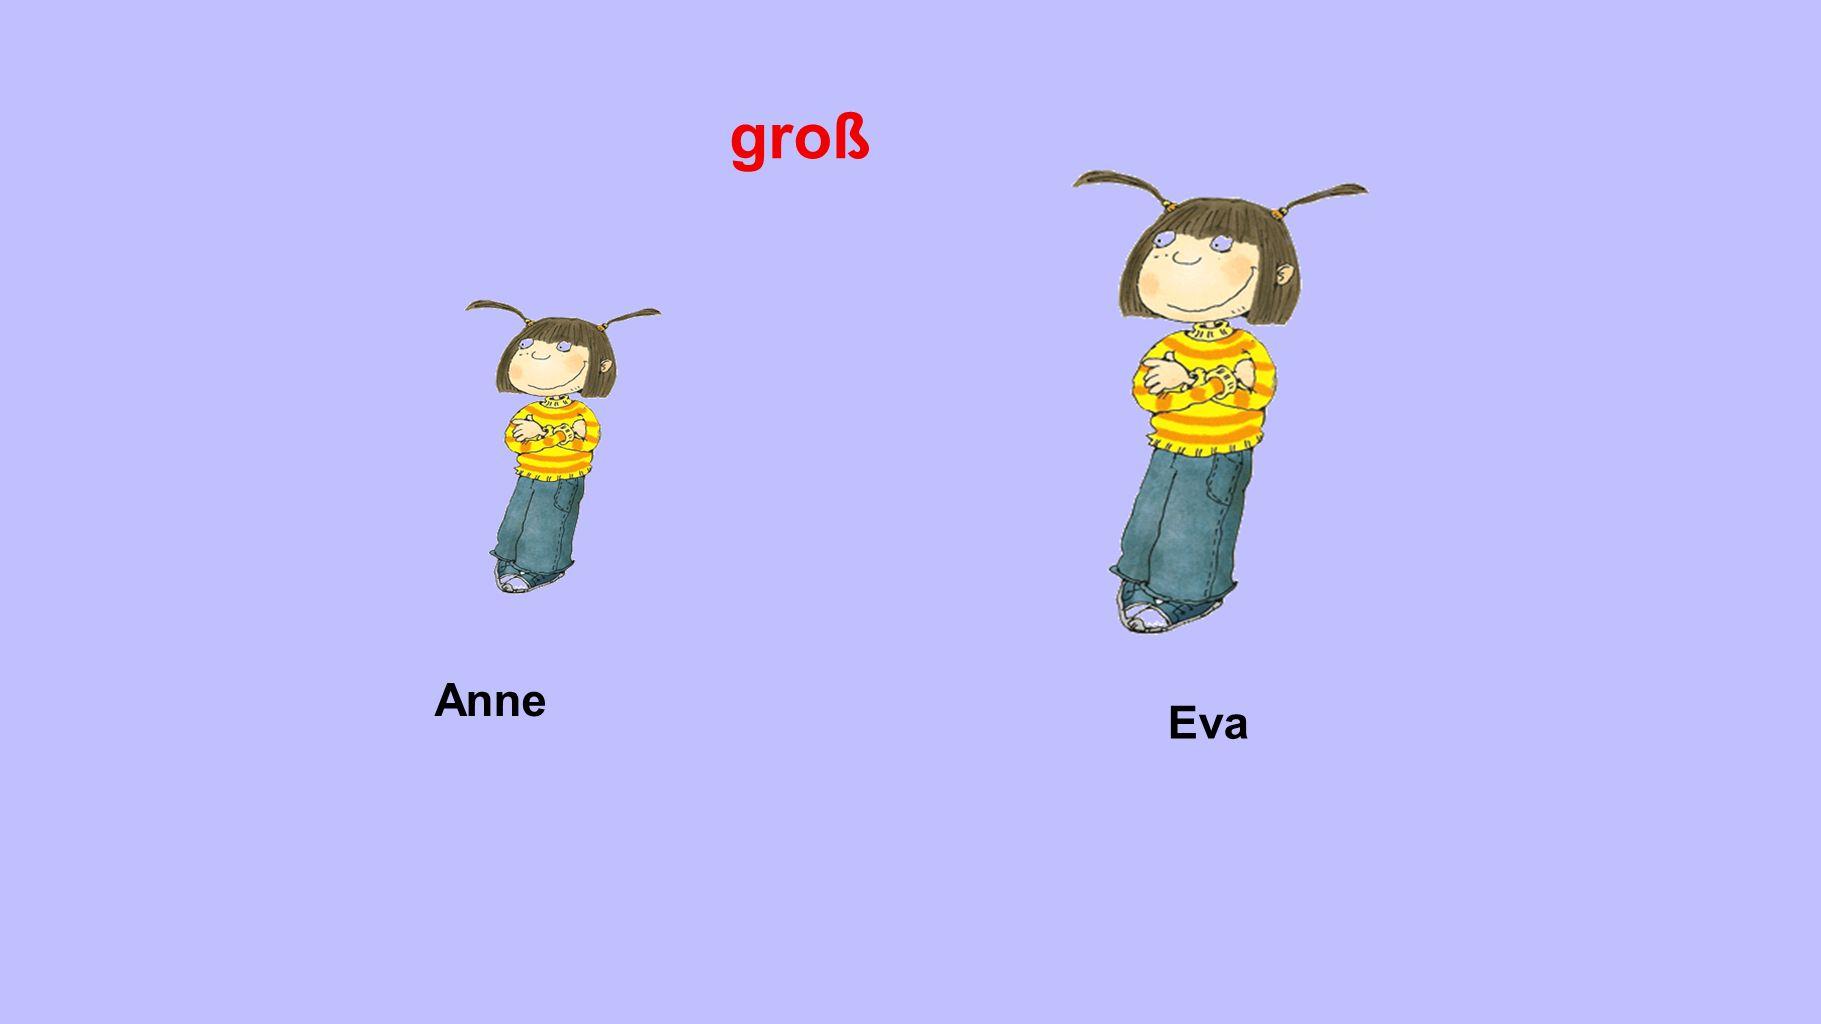 groß Anne Eva